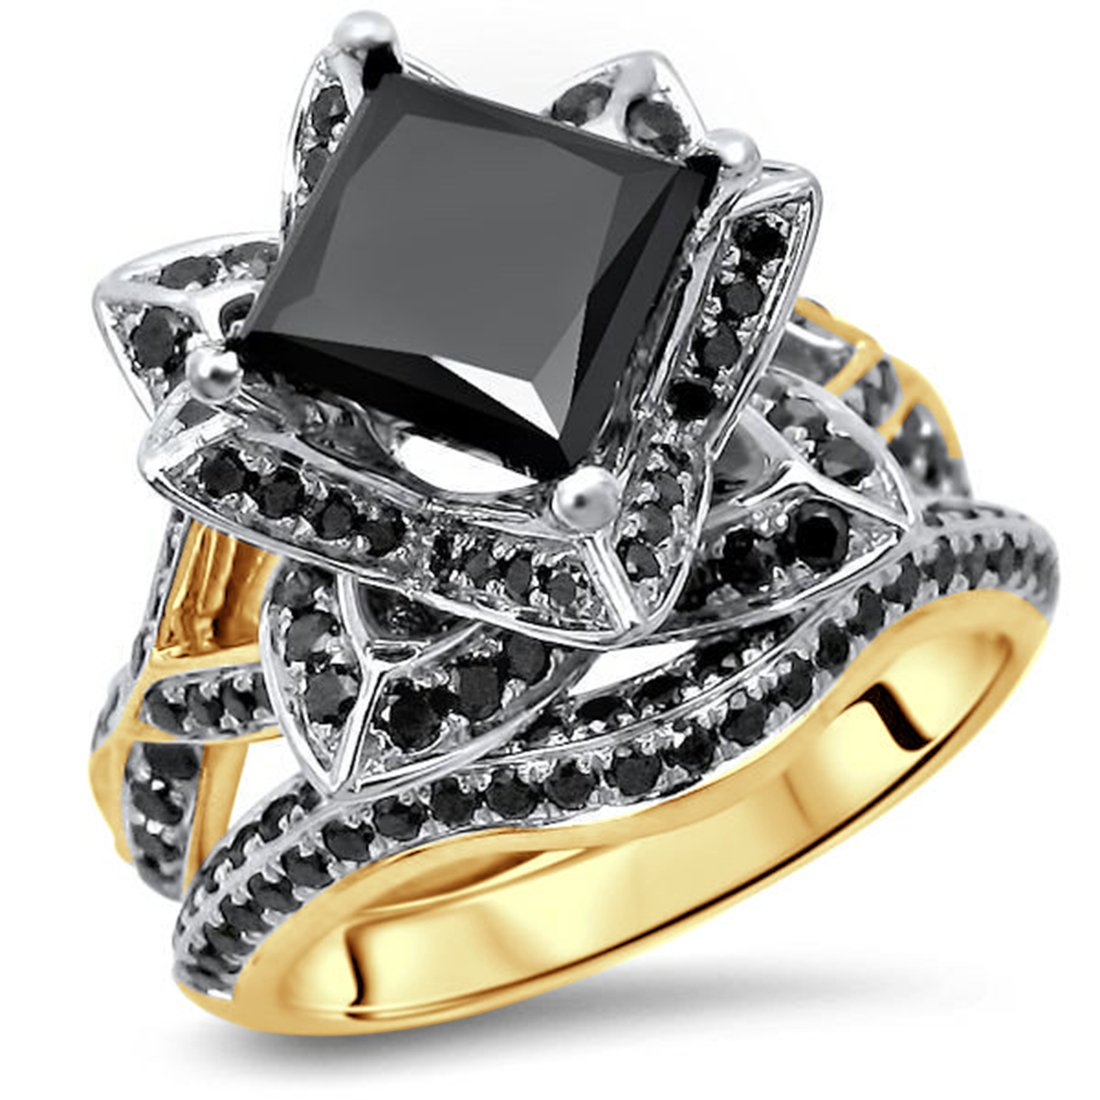 Smjewels 2.9Ct Black Princess Cut CZ Diamond Lotus Flower Engagement Ring Set Yellow Gold Fn